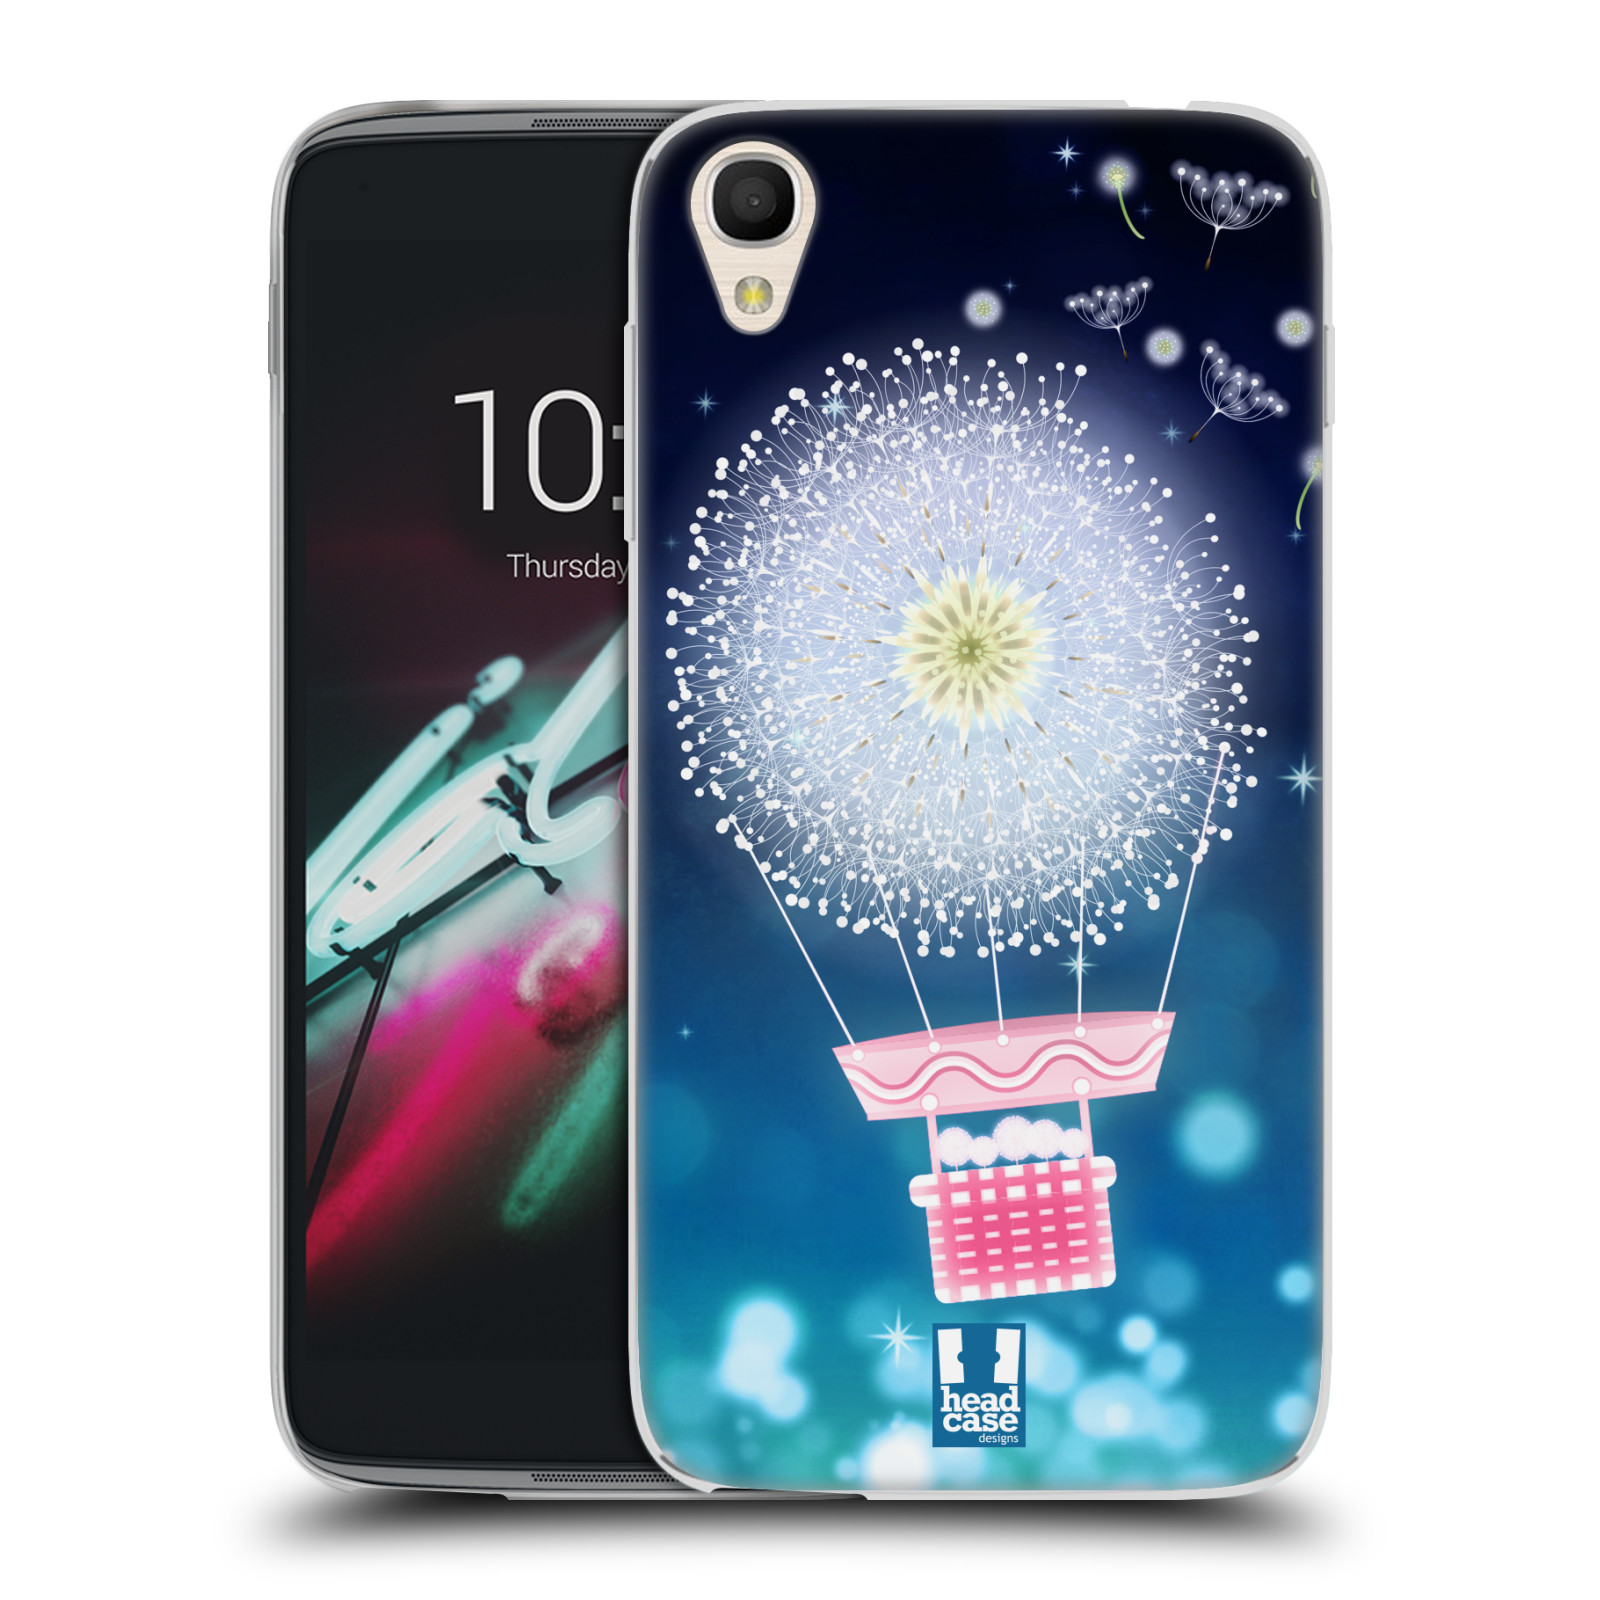 "Silikonové pouzdro na mobil Alcatel One Touch 6039Y Idol 3 HEAD CASE Pampeliškový balón (Silikonový kryt či obal na mobilní telefon Alcatel One Touch Idol 3 OT-6039Y s 4,7"" displejem)"